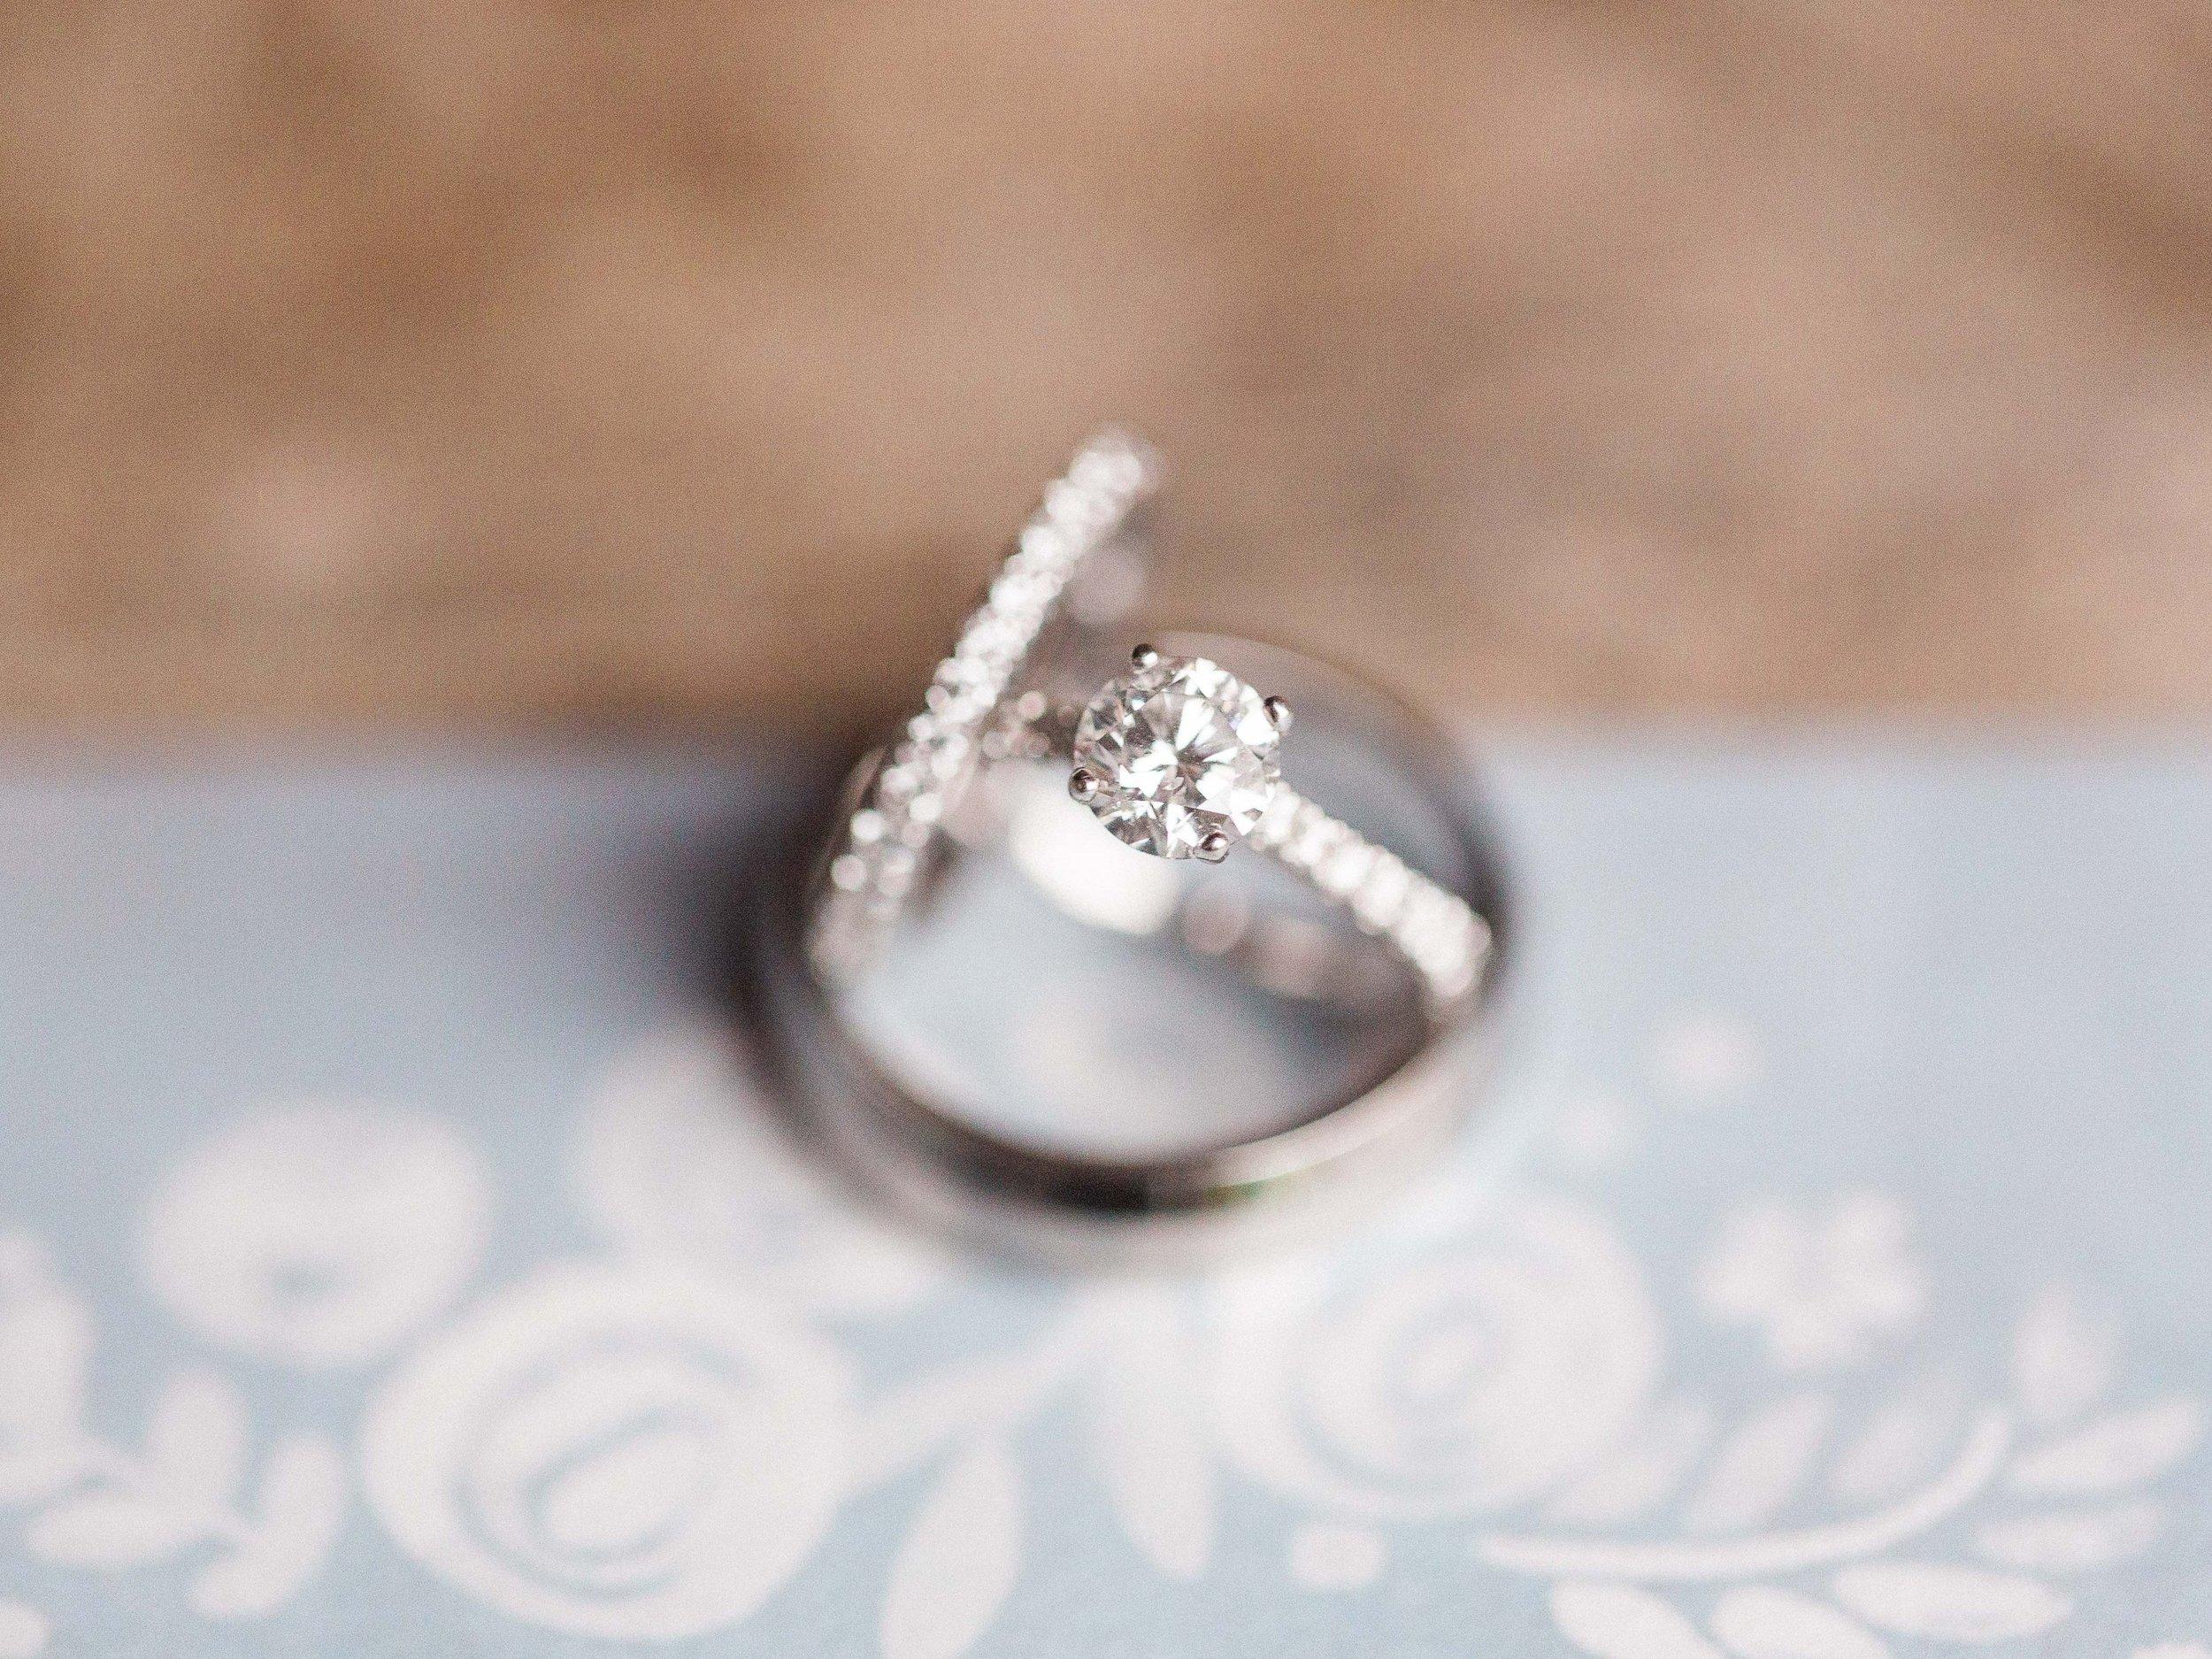 ERIC AND HALLIE WEDDING-HI RESOLUTION FOR PRINTING-0006.jpg